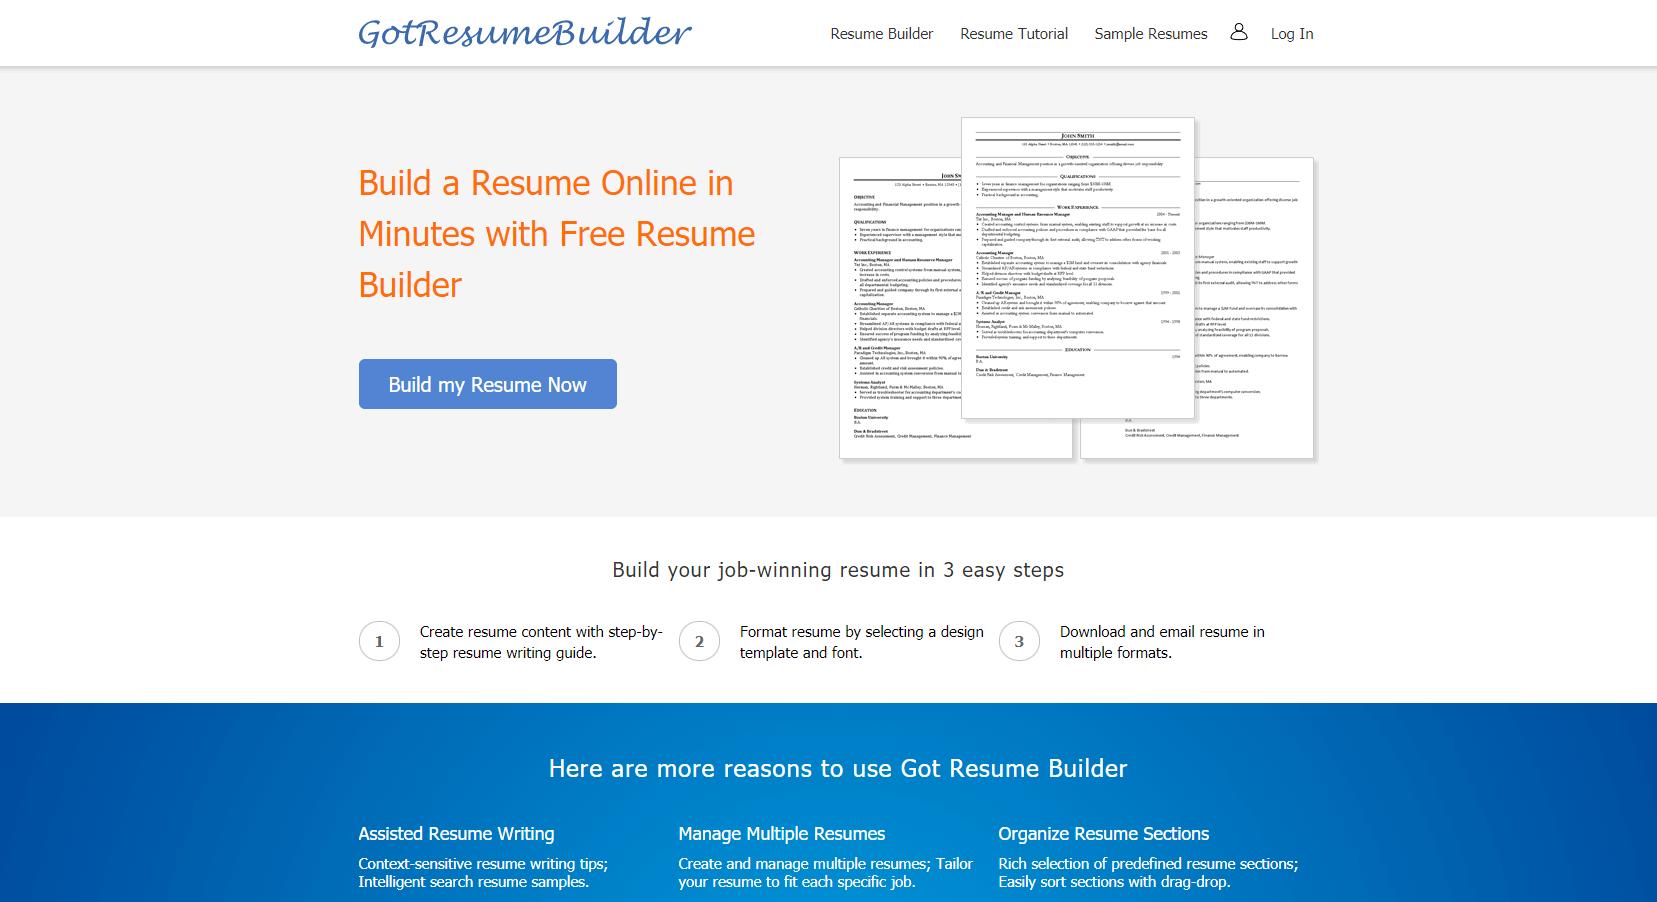 gotresumebuilder.com Review by TopResumeWritingServices